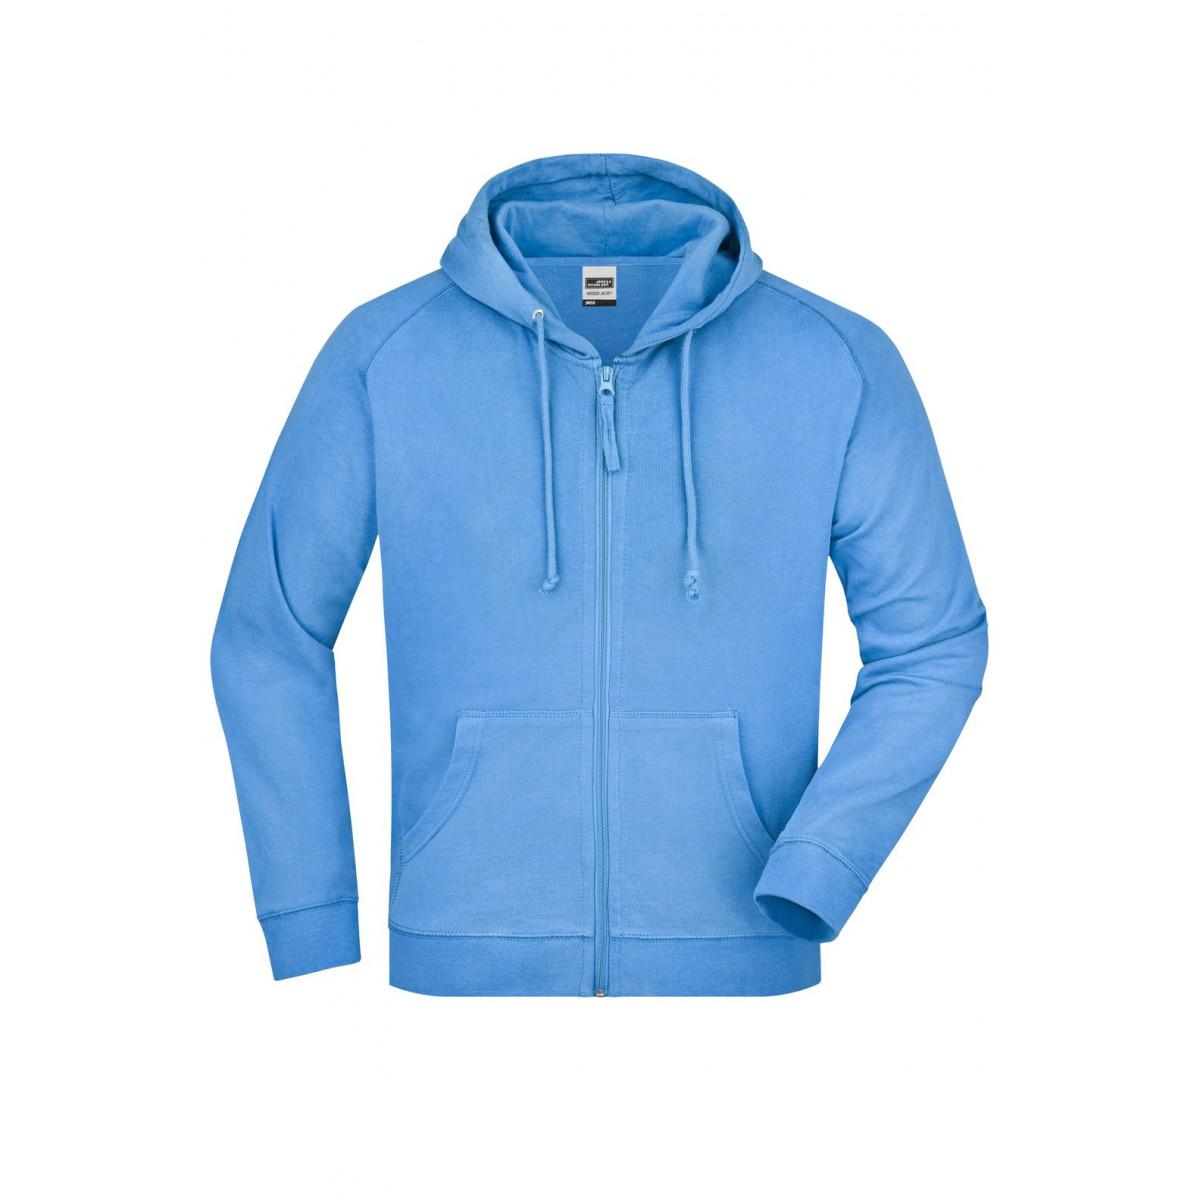 Толстовка мужская JN059 Hooded Jacket - Голубой